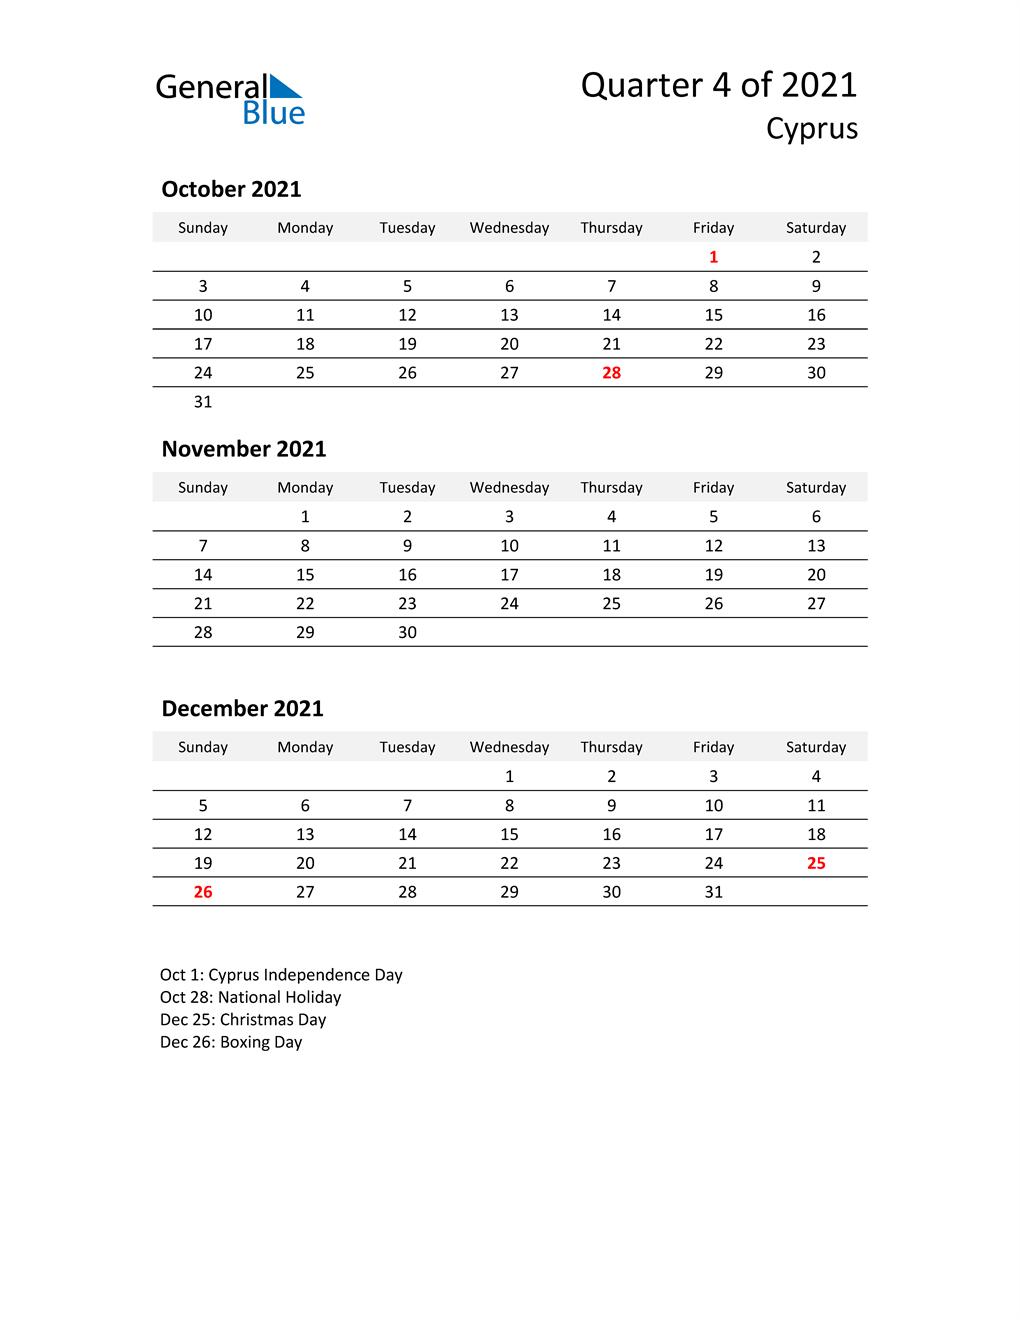 2021 Three-Month Calendar for Cyprus